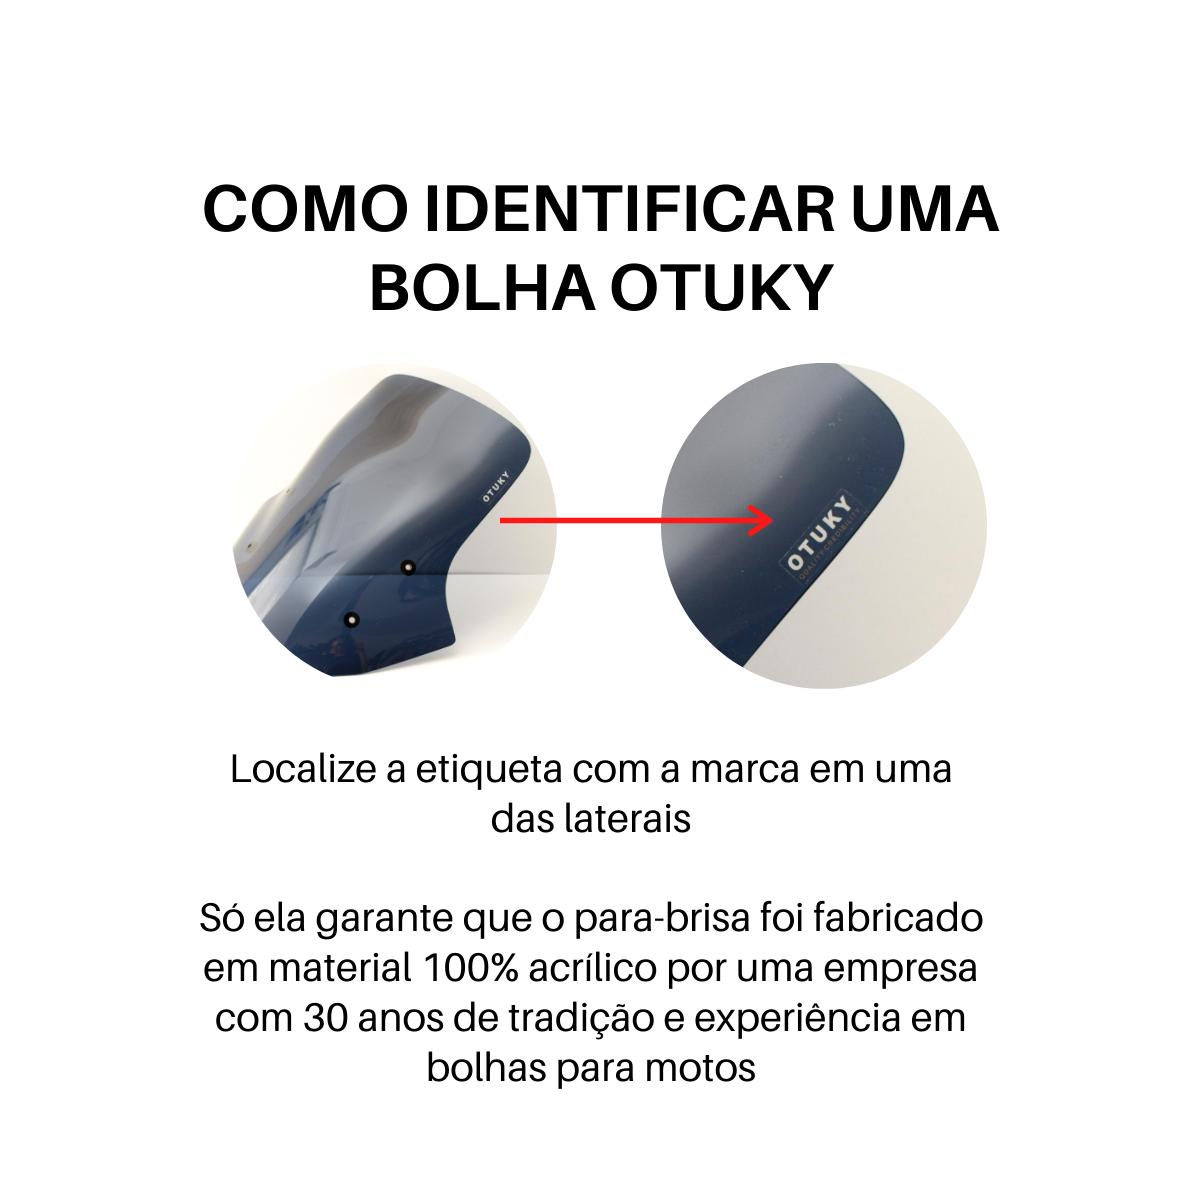 Bolha para Moto Nmax 160 2017 2018 2019 2020 2021 Otuky Padrão Cristal